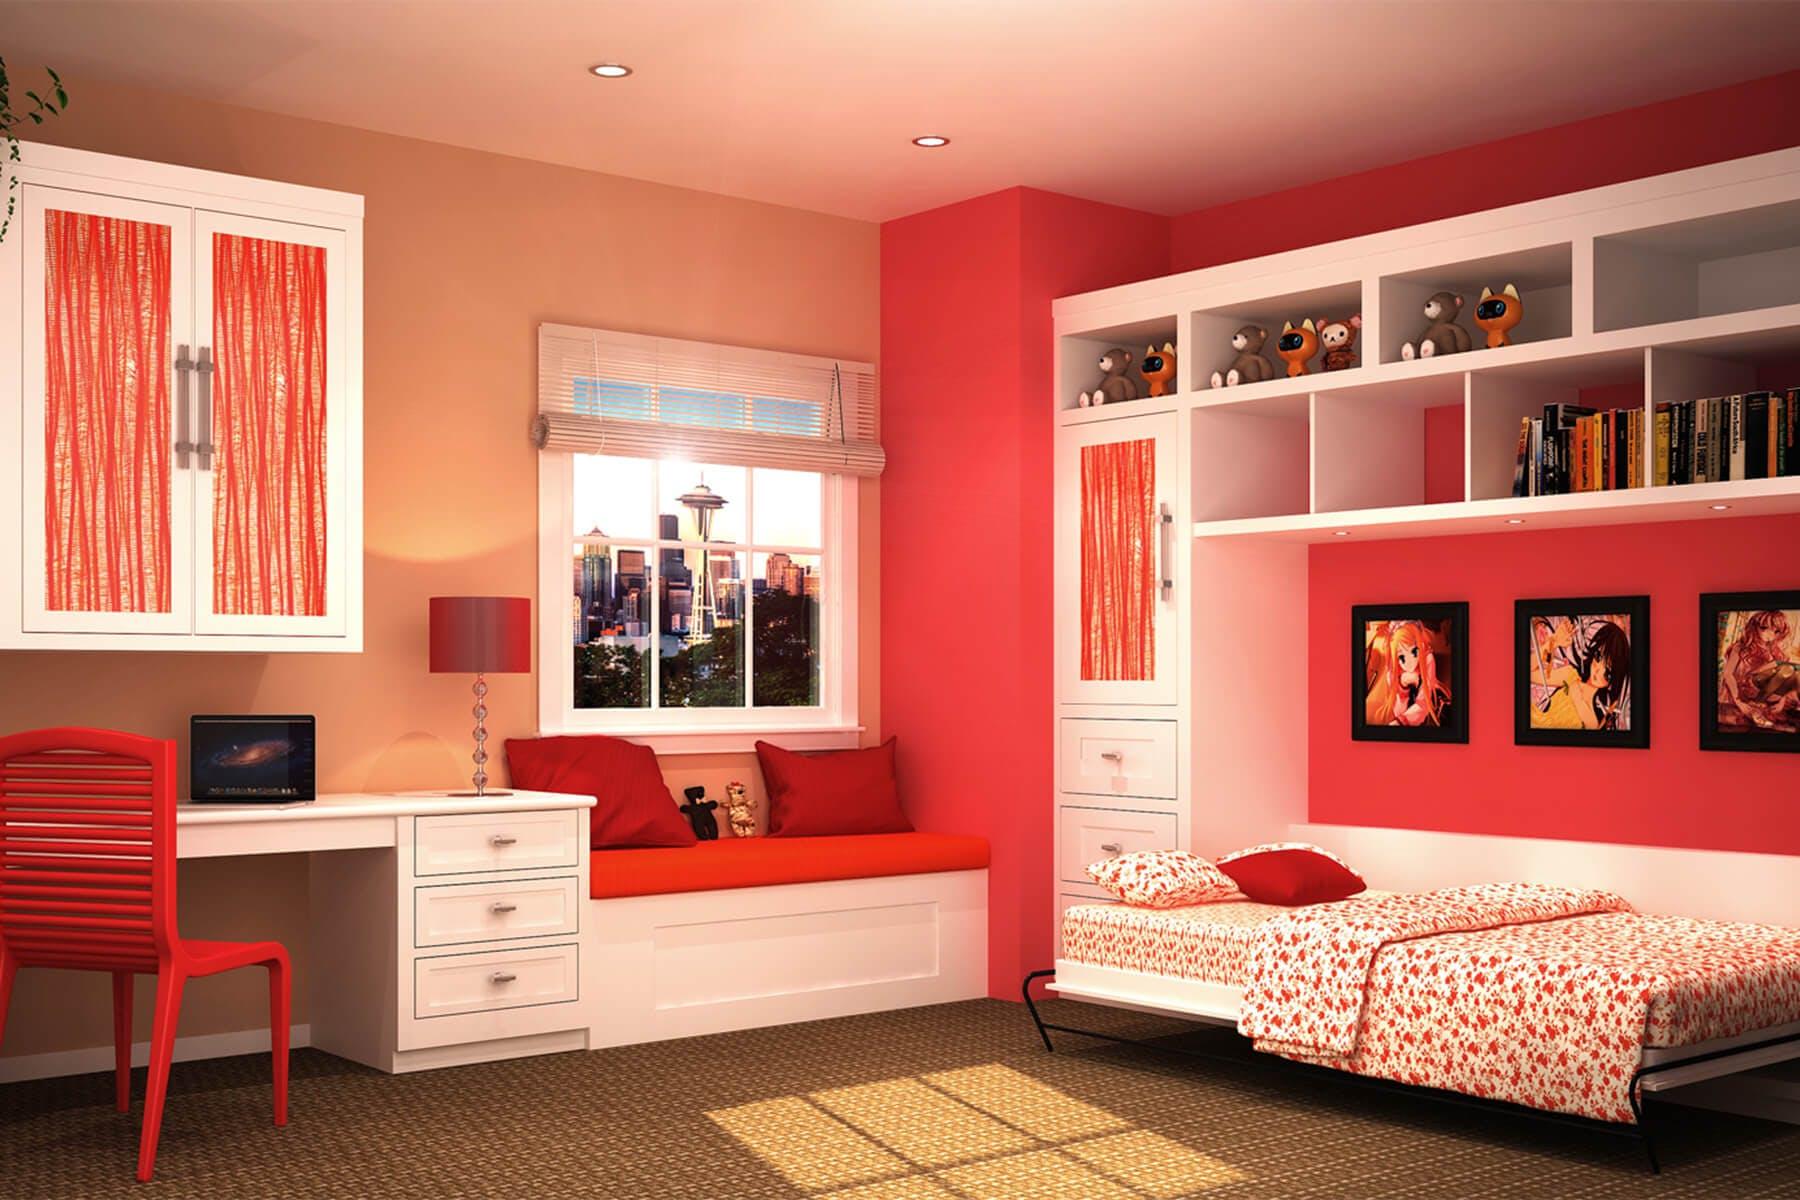 Wall Beds And Murphy Beds Cabinet Design Closet Factory